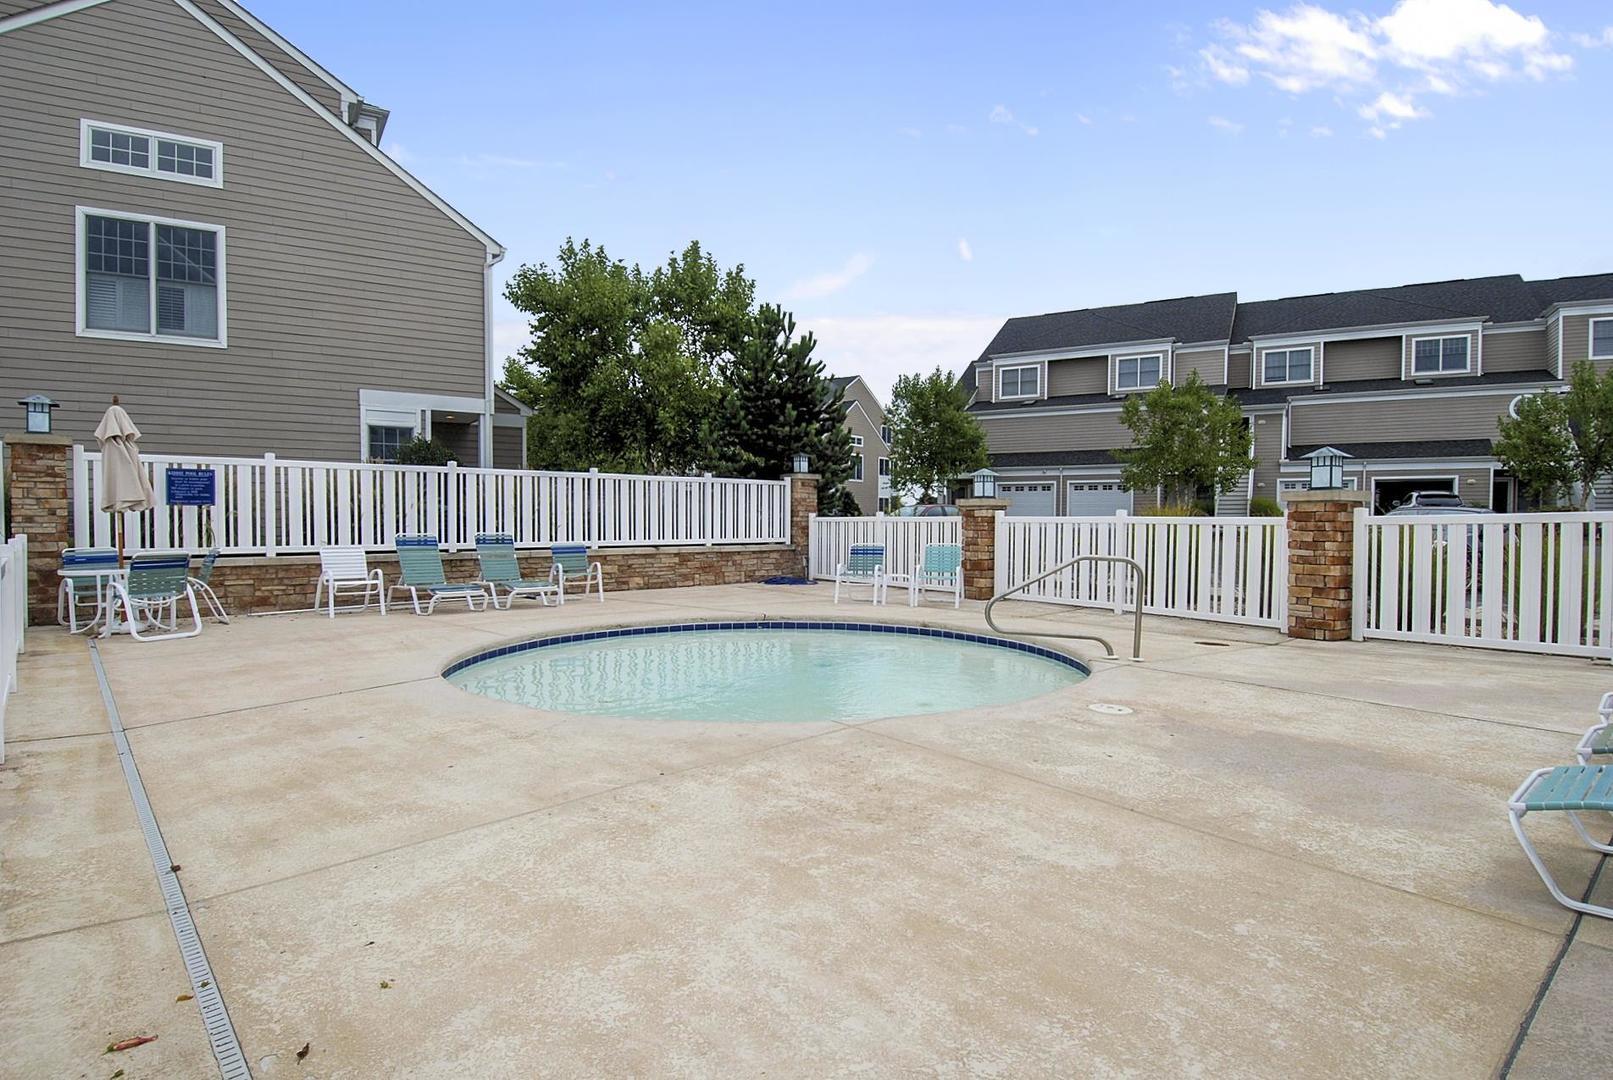 Bayville Shores Kiddie Pool (open seasonally)